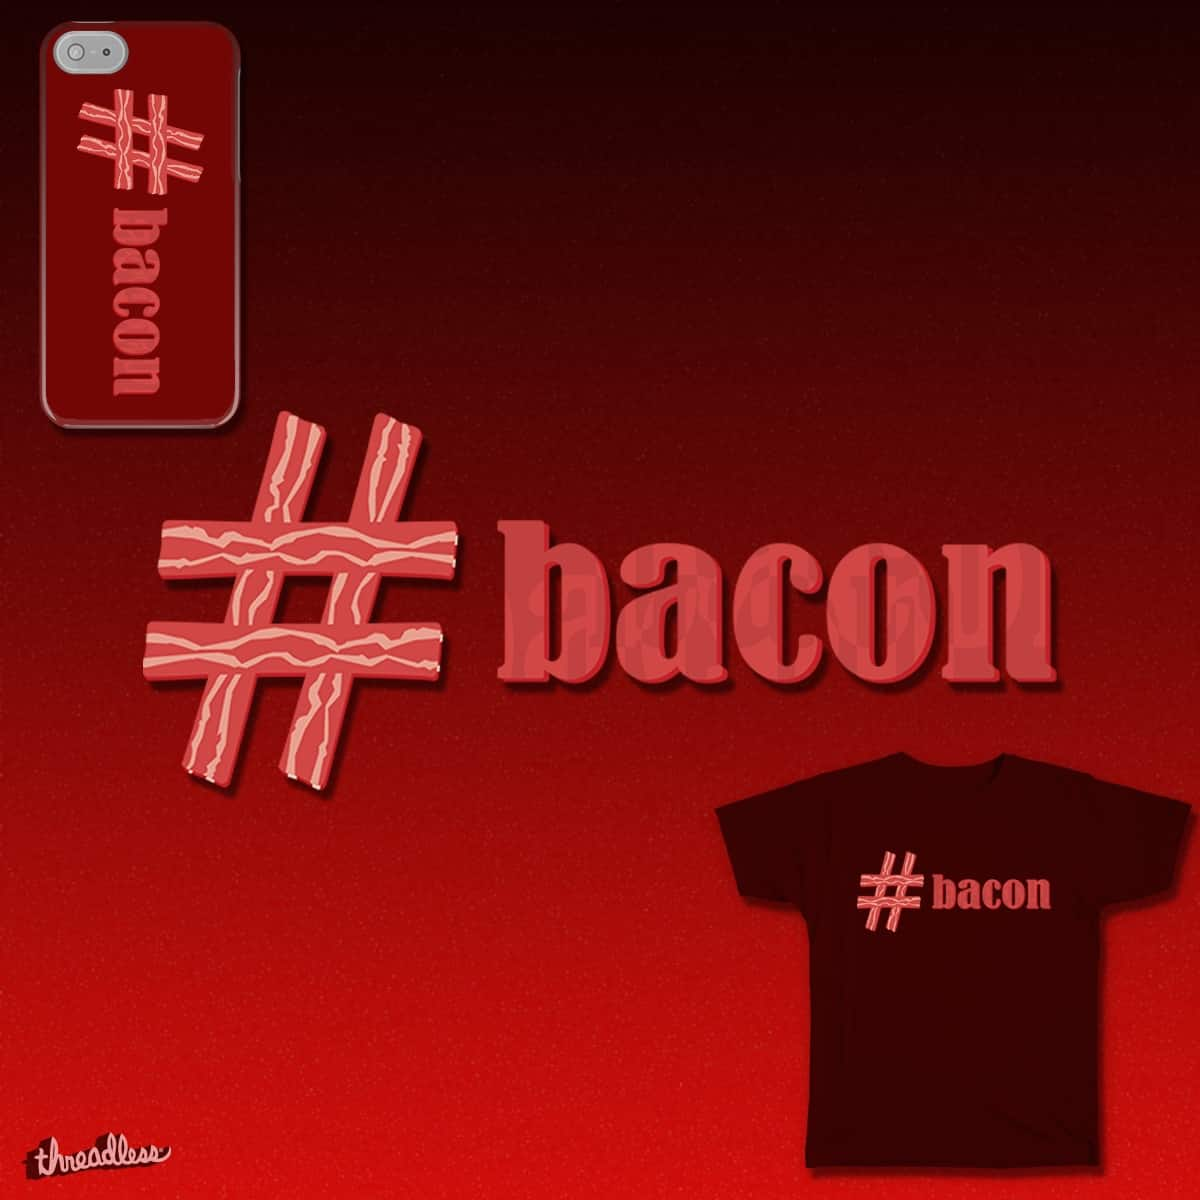 Mmmmmmmmm.... #bacon! by YabuloStore919 on Threadless